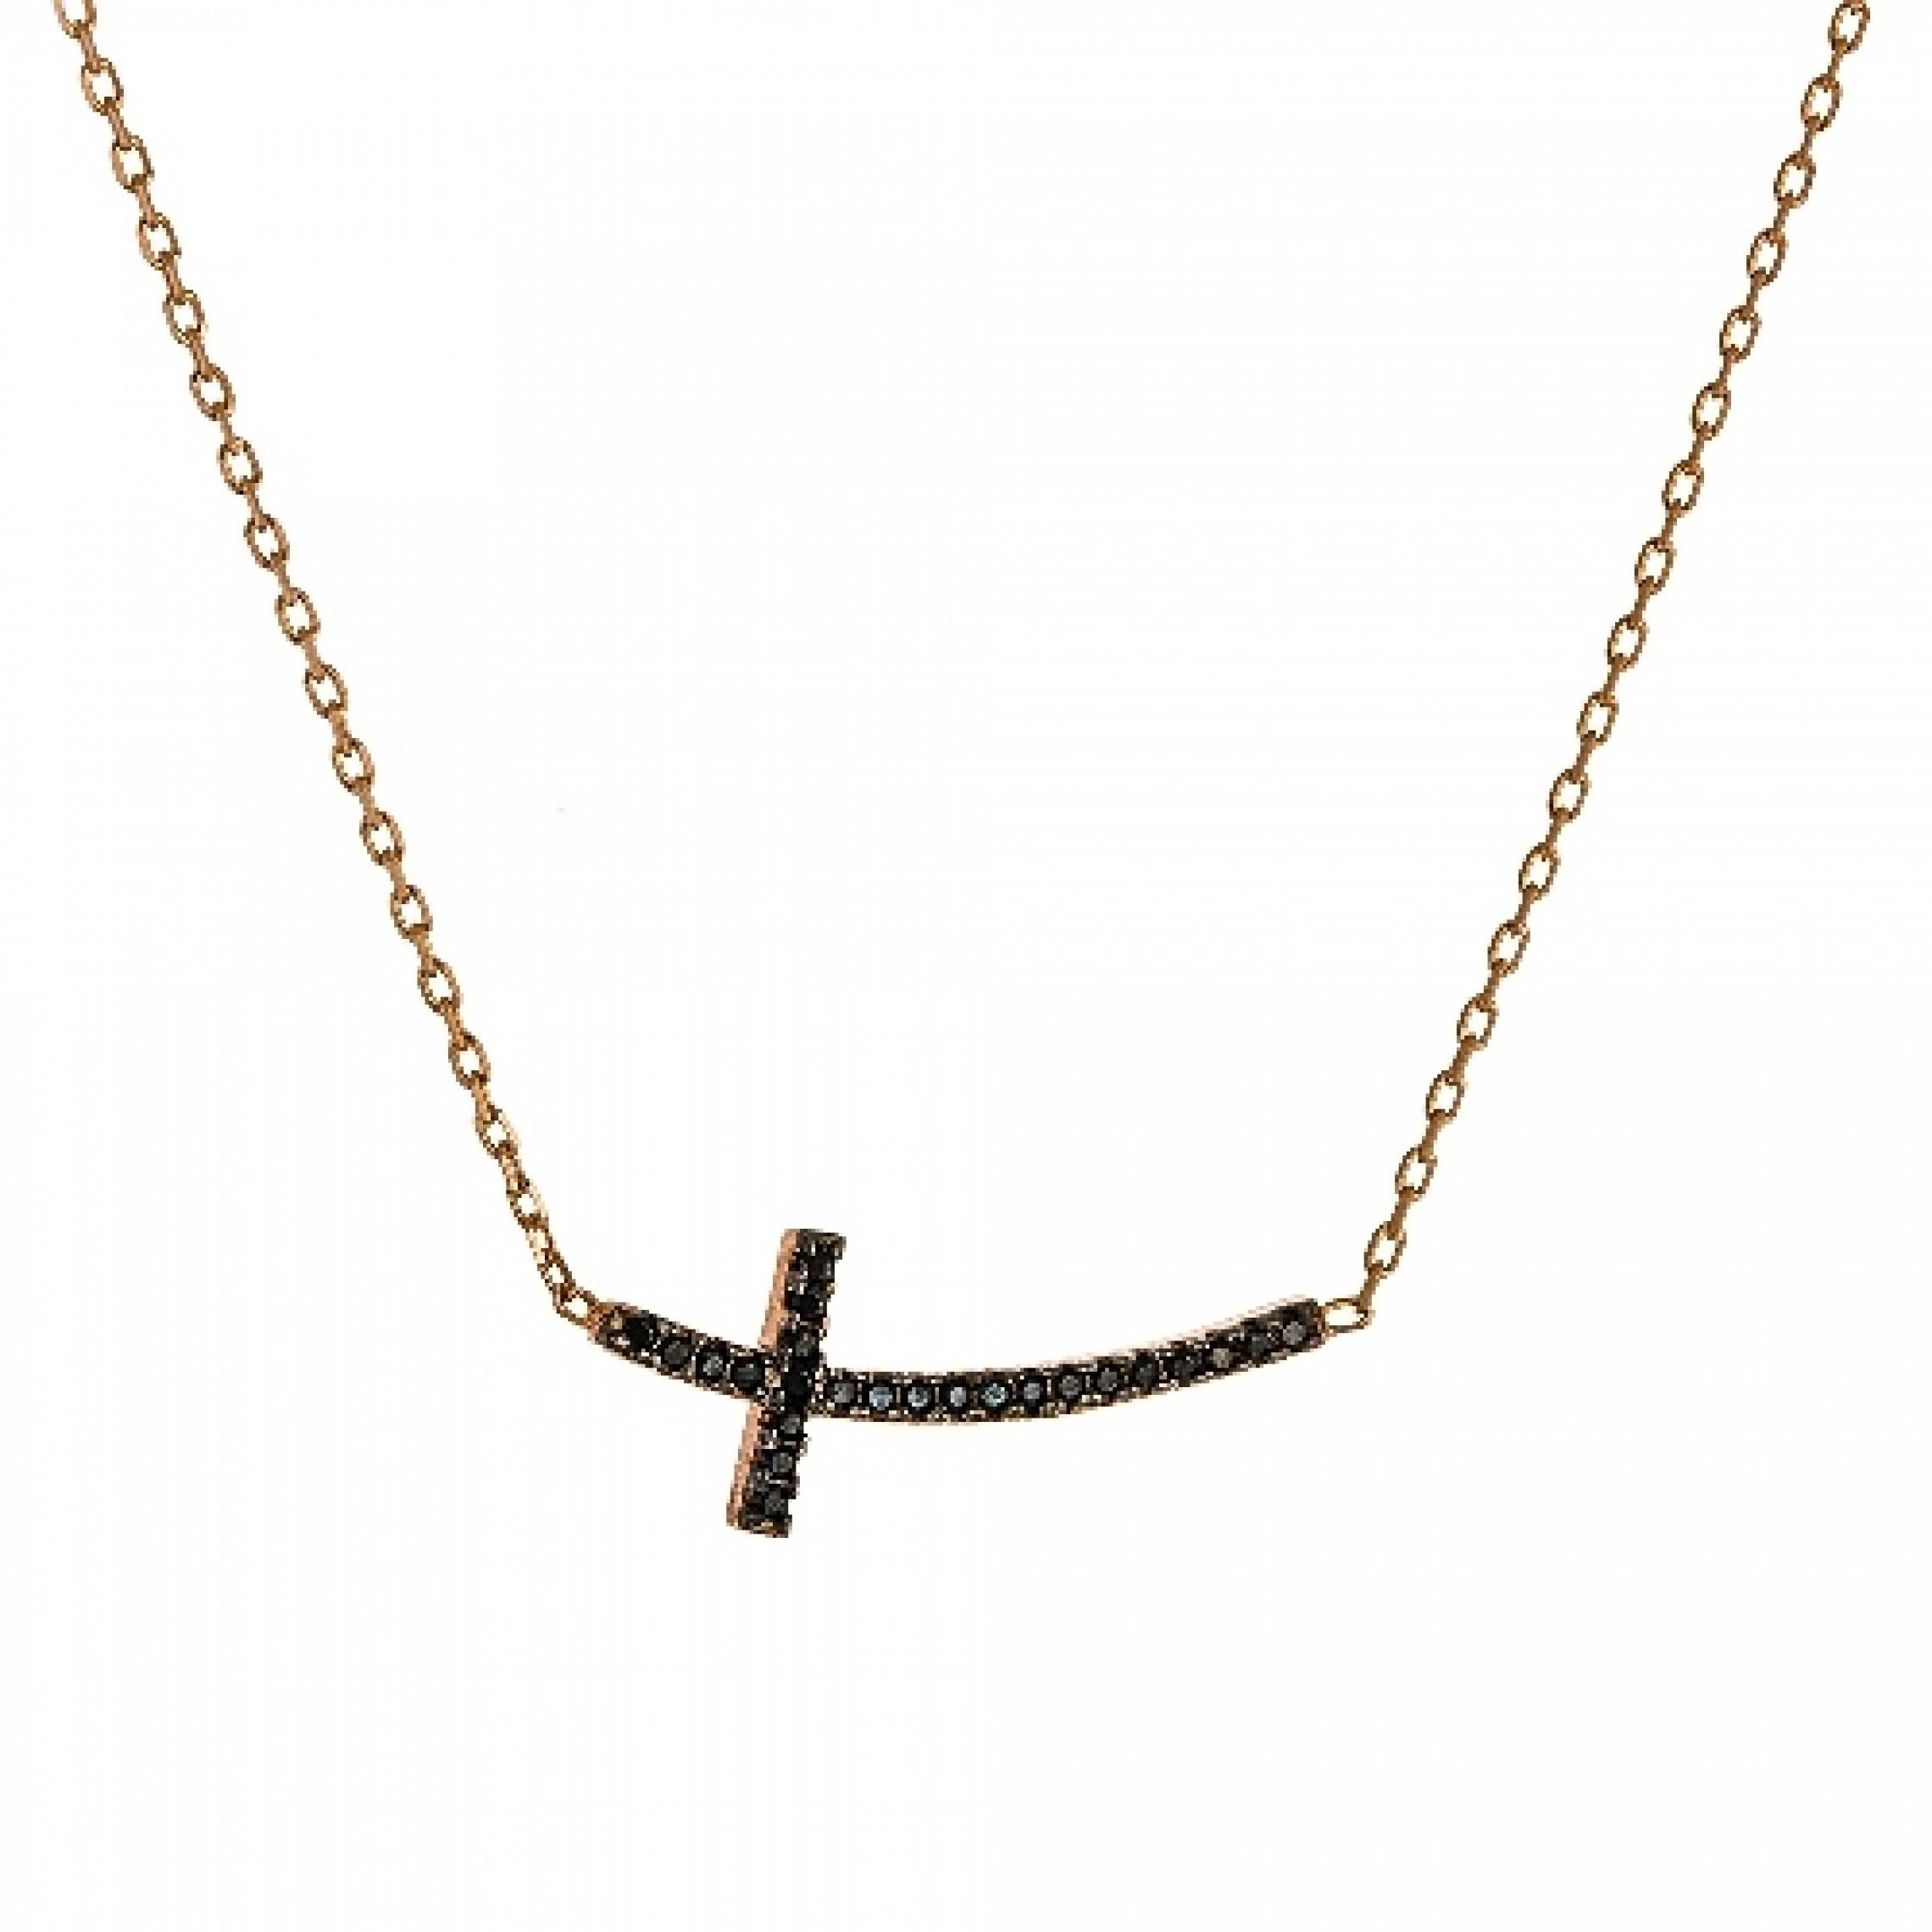 JN-190130 Evil Eye 925 Sterling Silver CZ Necklace Cross